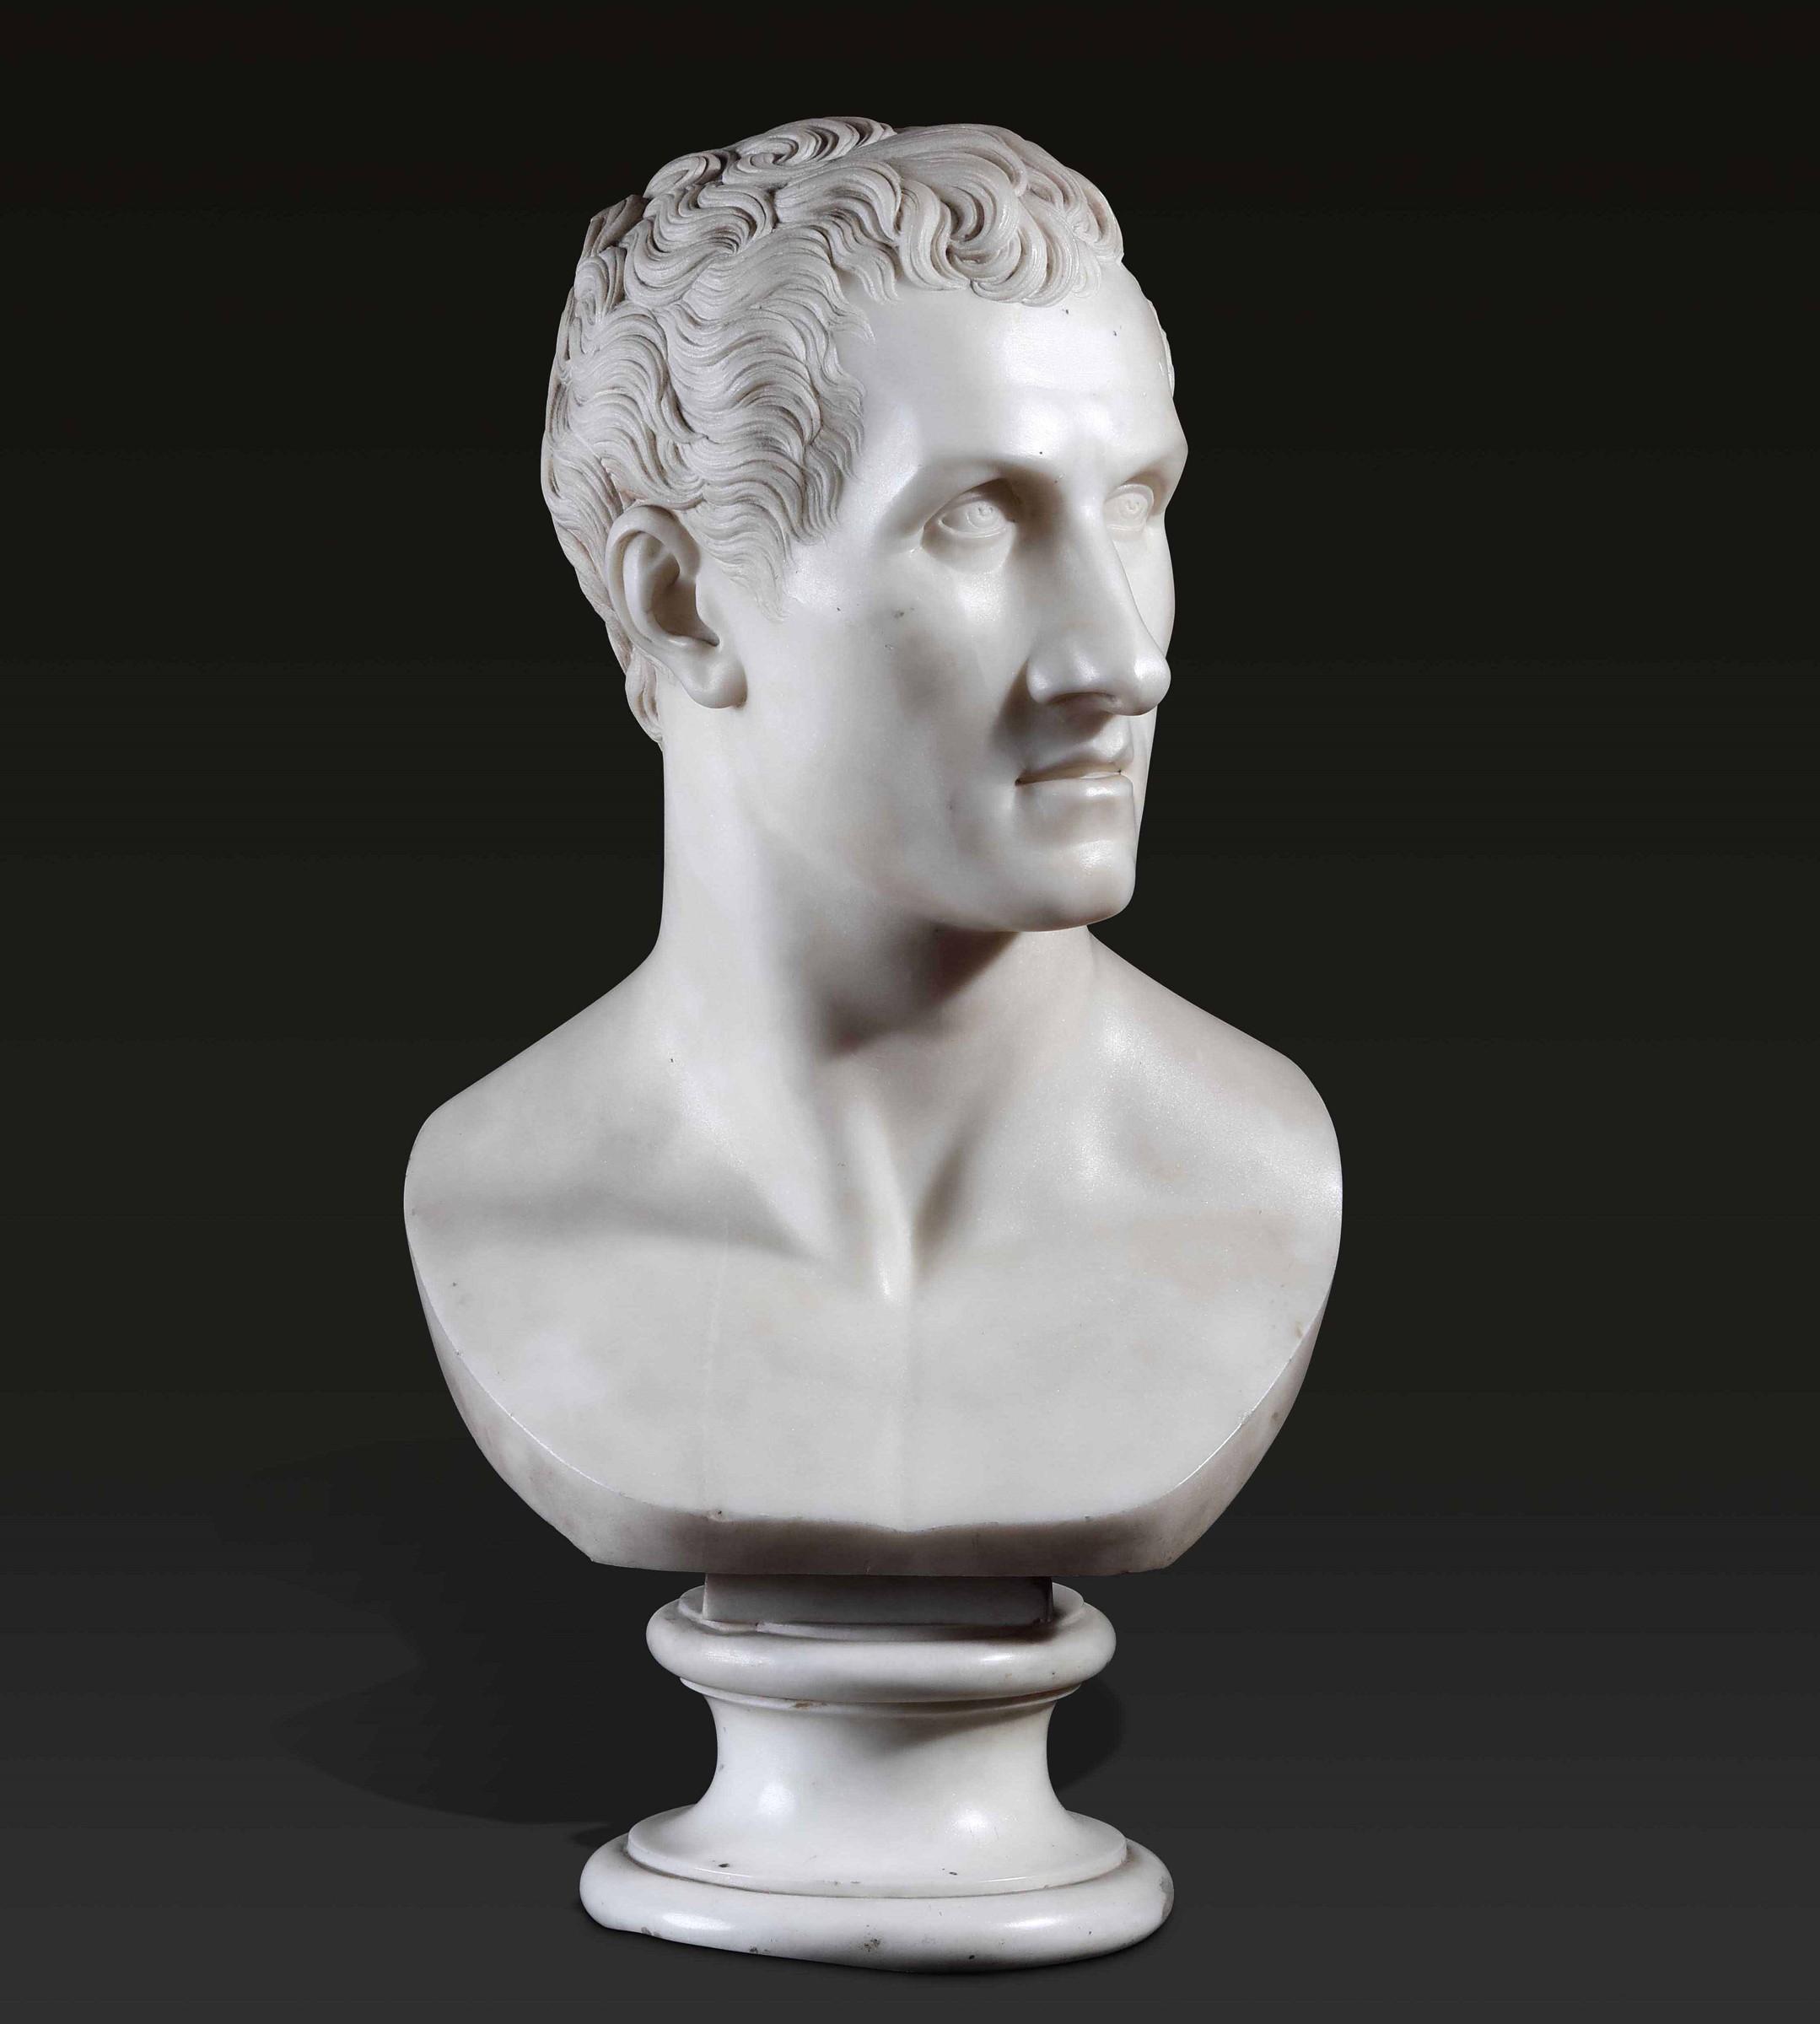 A marble bust of Canova, R. Trentanove, Rome, 1822 - altezza cm 59. Raimondo [...]